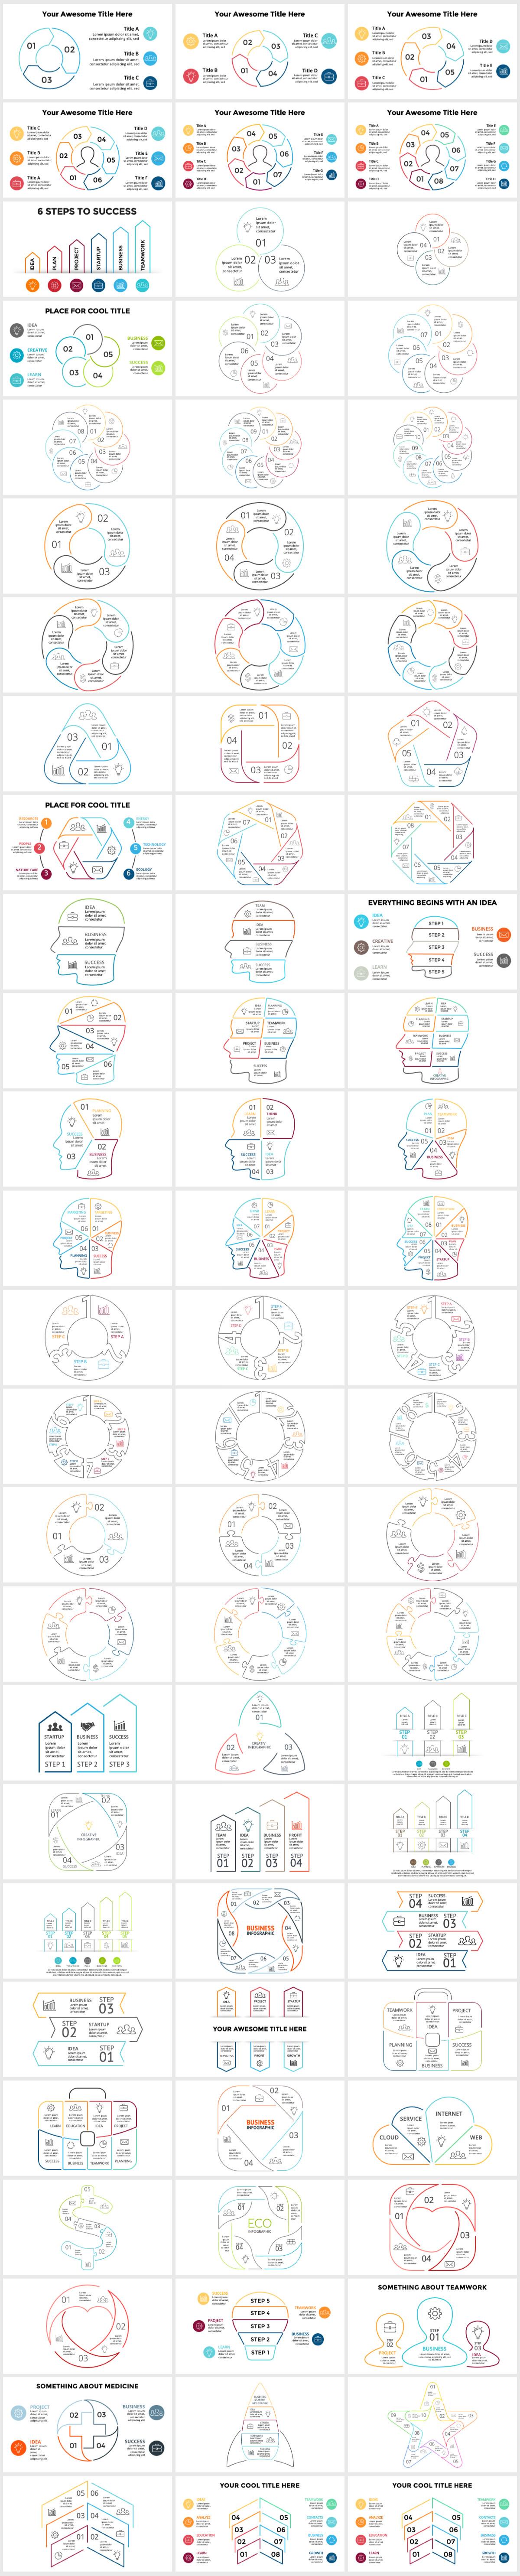 Huge Infographics Bundle! Lifetime Updates! PowerPoint, Photoshop, Illustrator. - 231